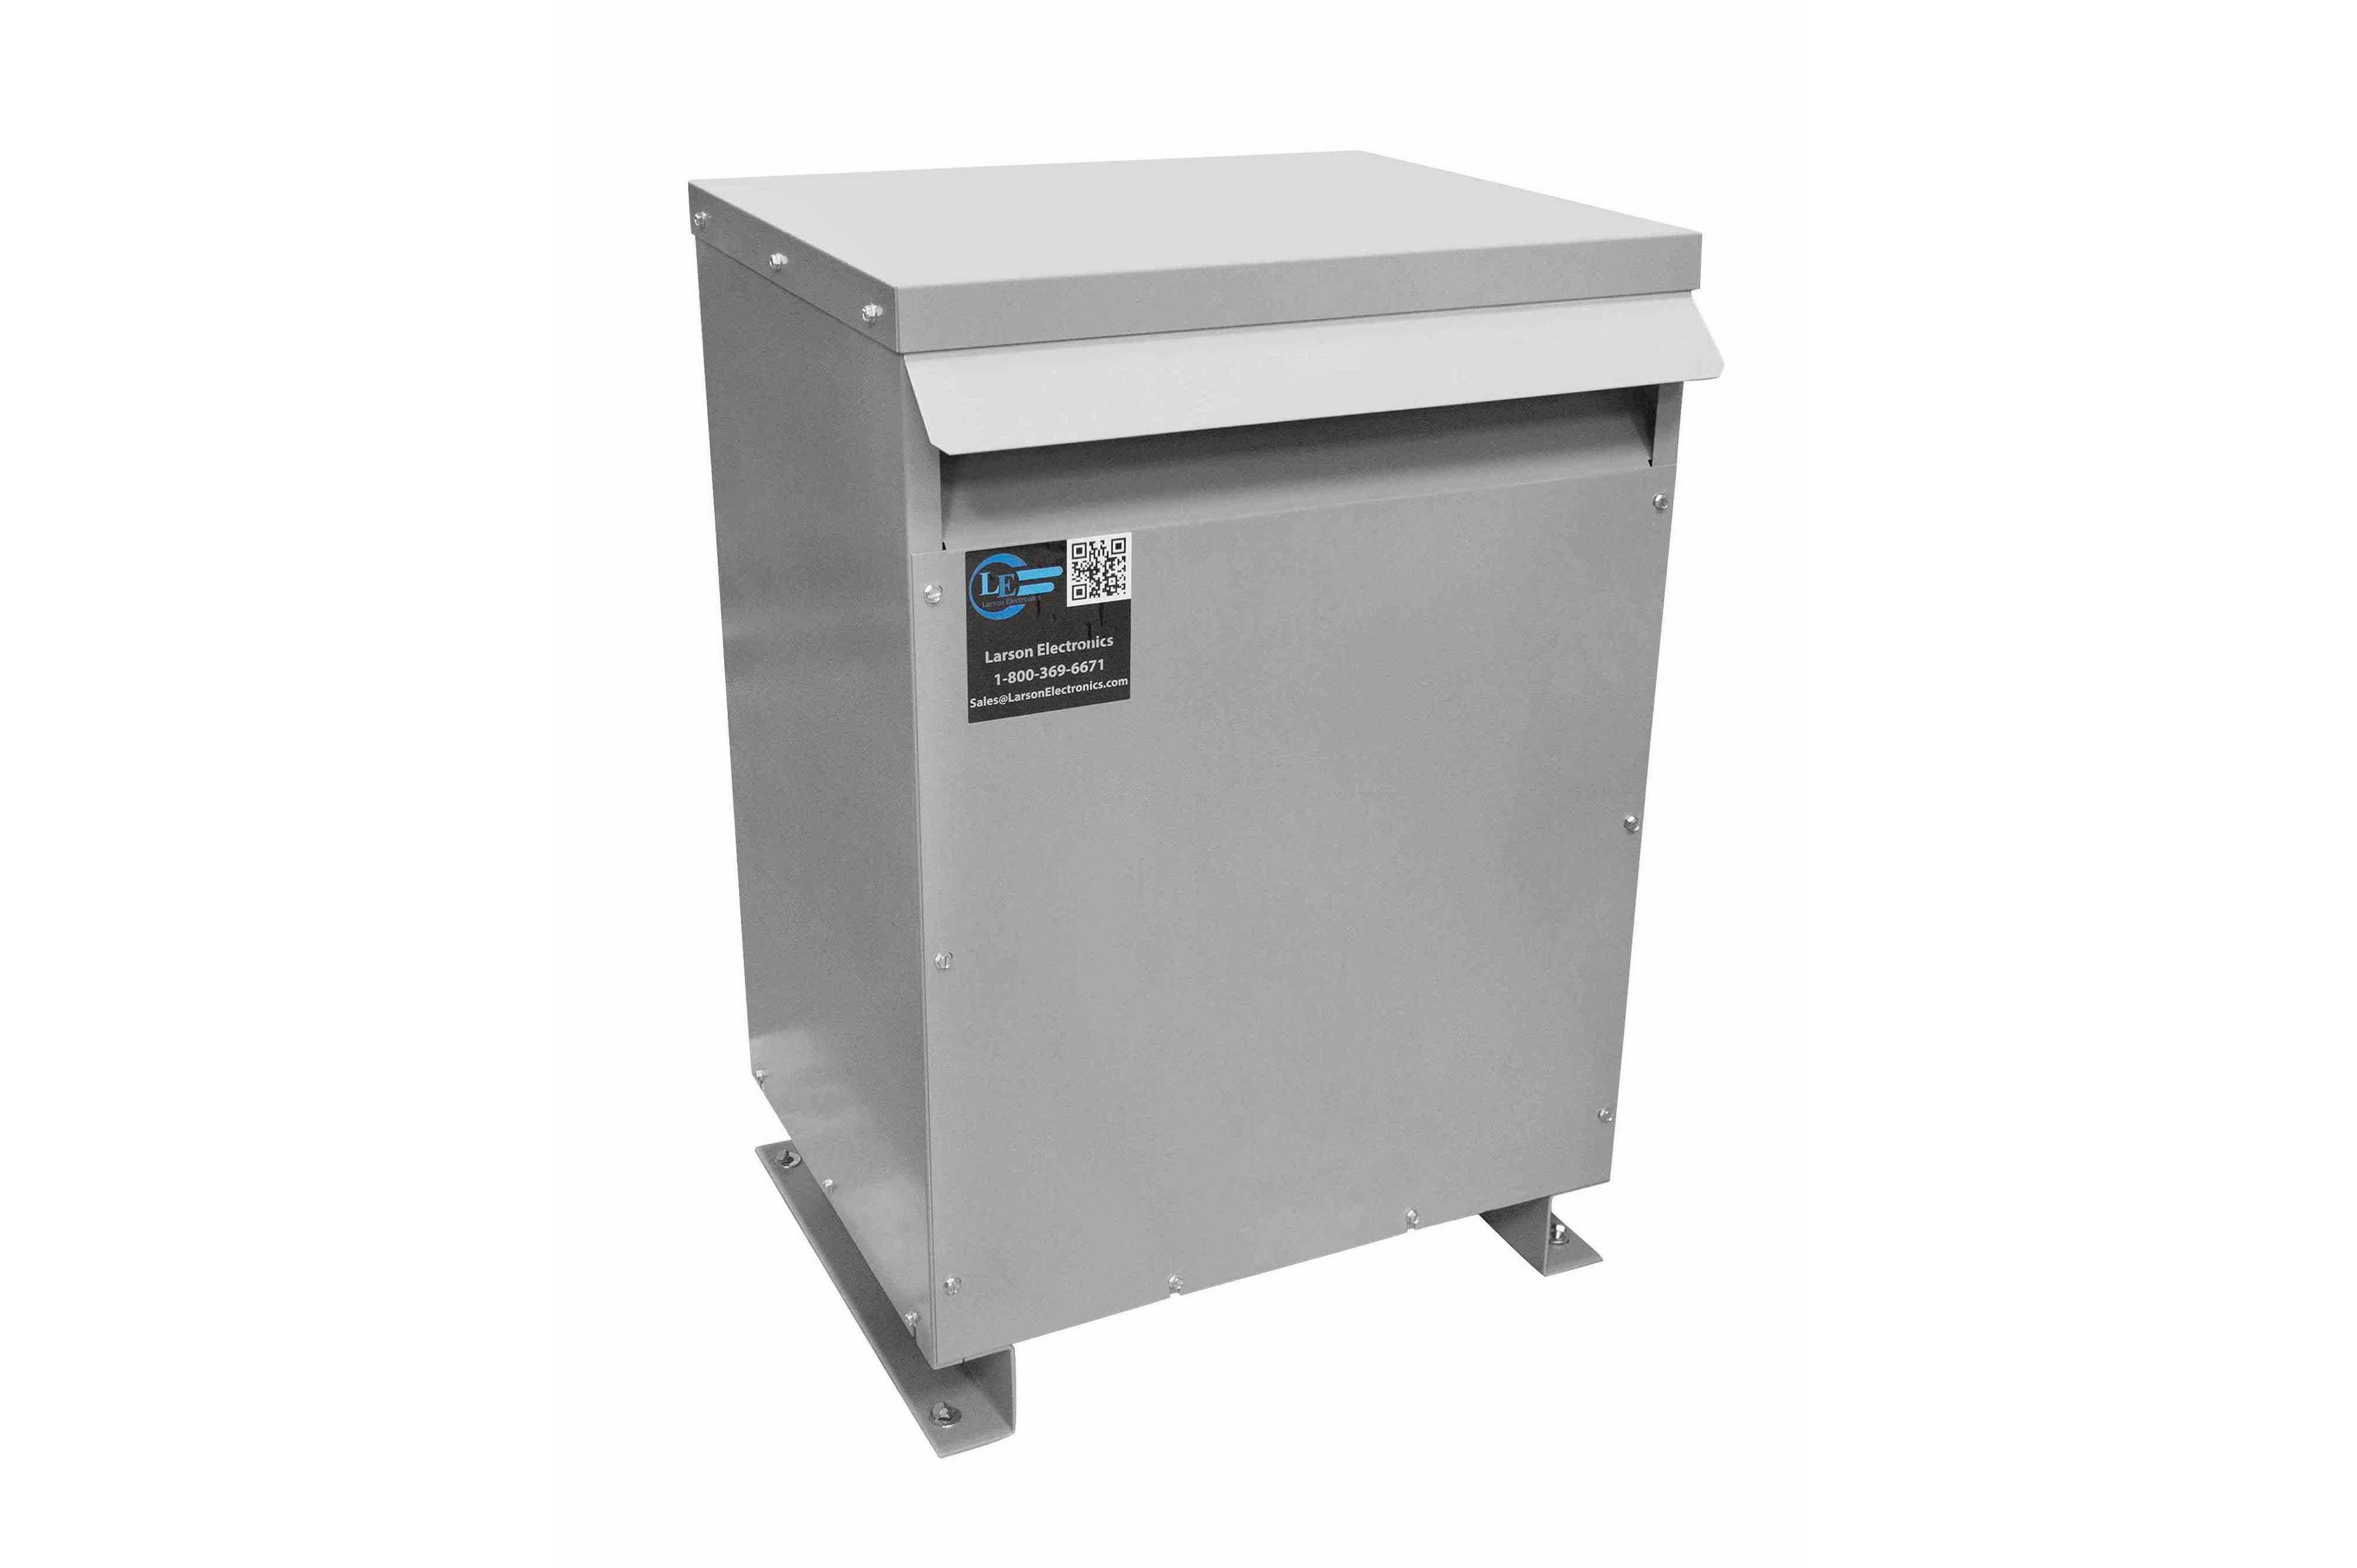 70 kVA 3PH Isolation Transformer, 575V Wye Primary, 400Y/231 Wye-N Secondary, N3R, Ventilated, 60 Hz